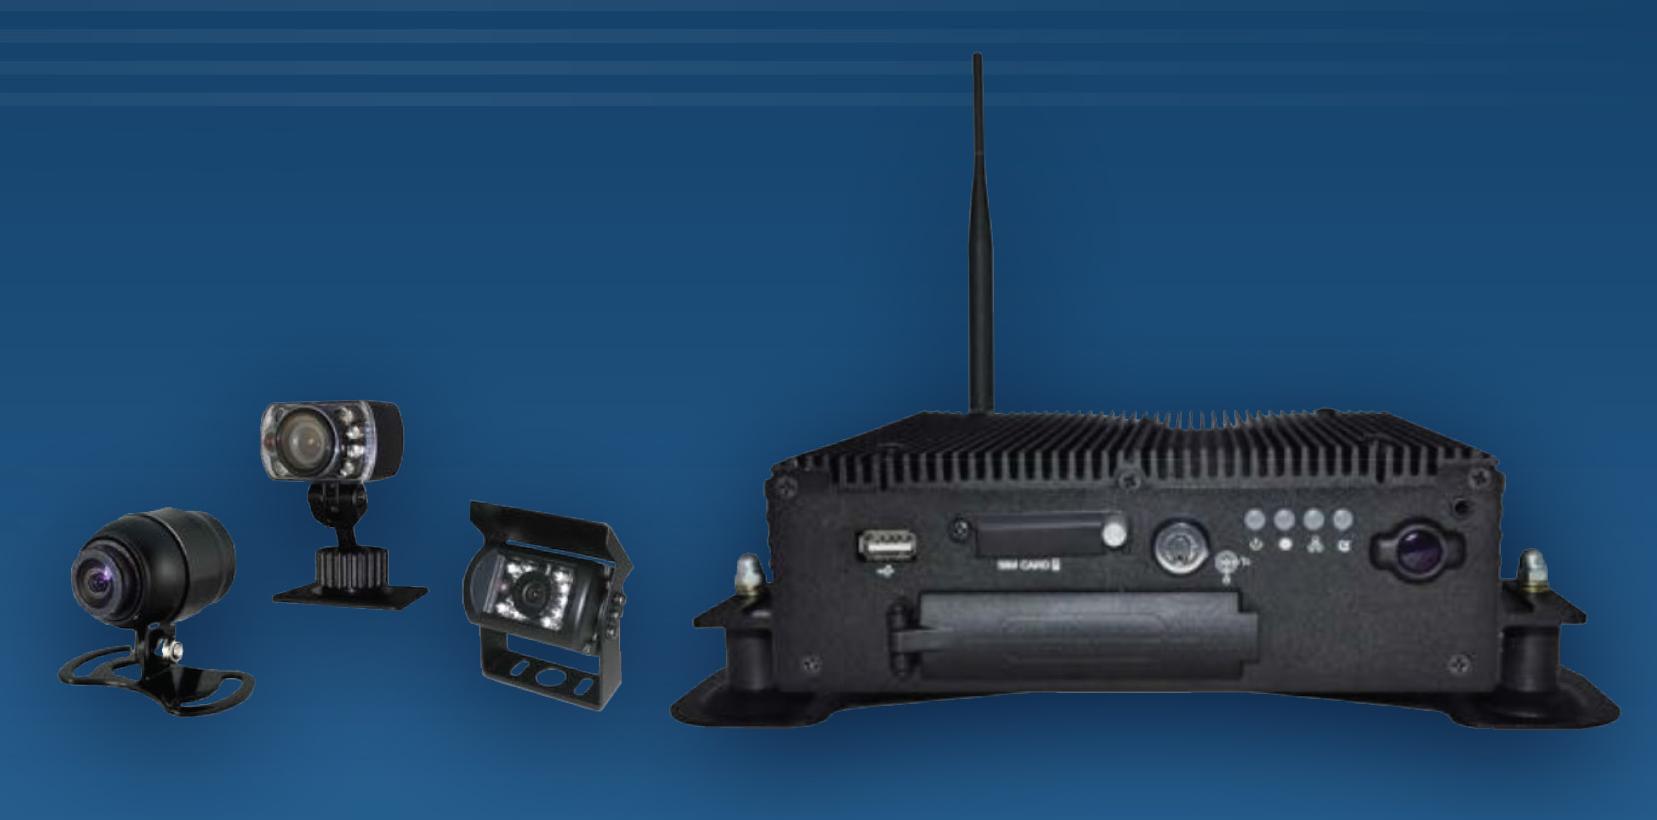 DVR-SYSTEM